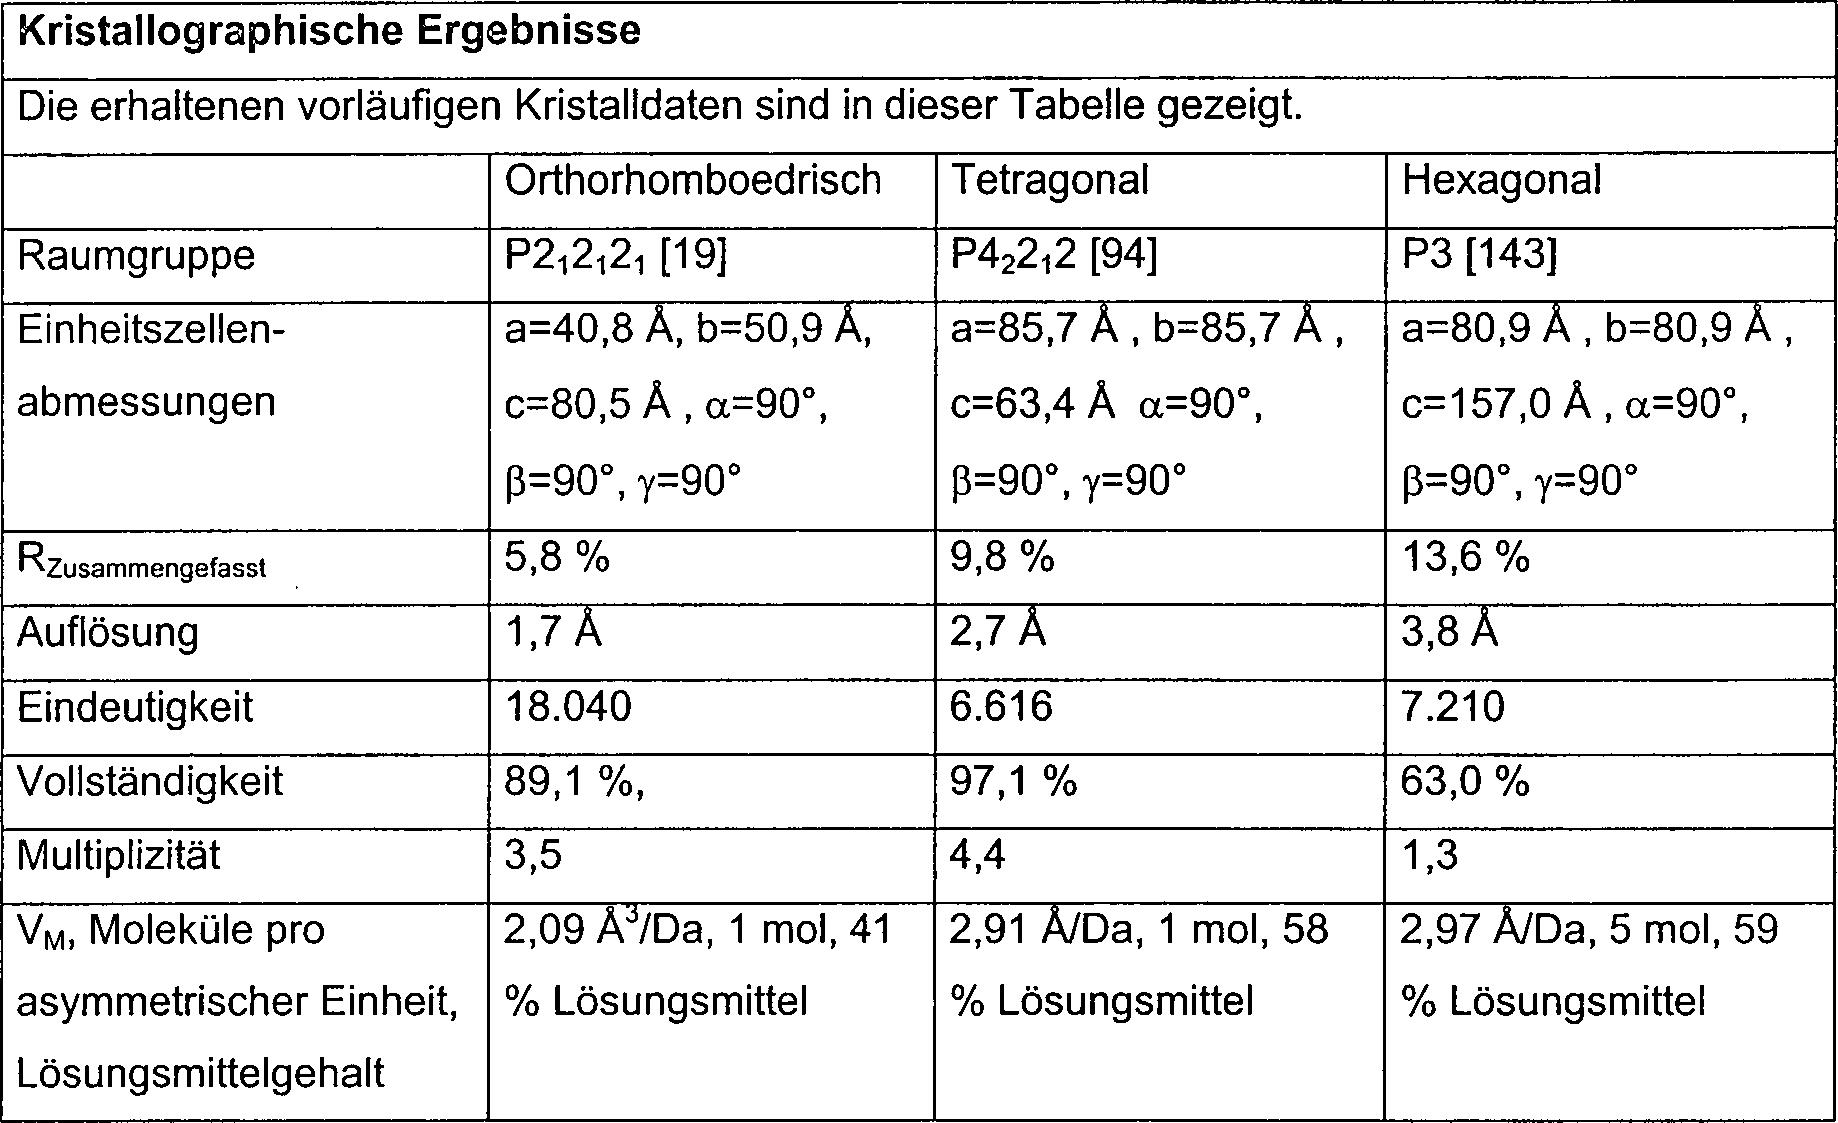 DE69927518T2 - Rekombinante lösliche fc rezeptoren - Google Patents